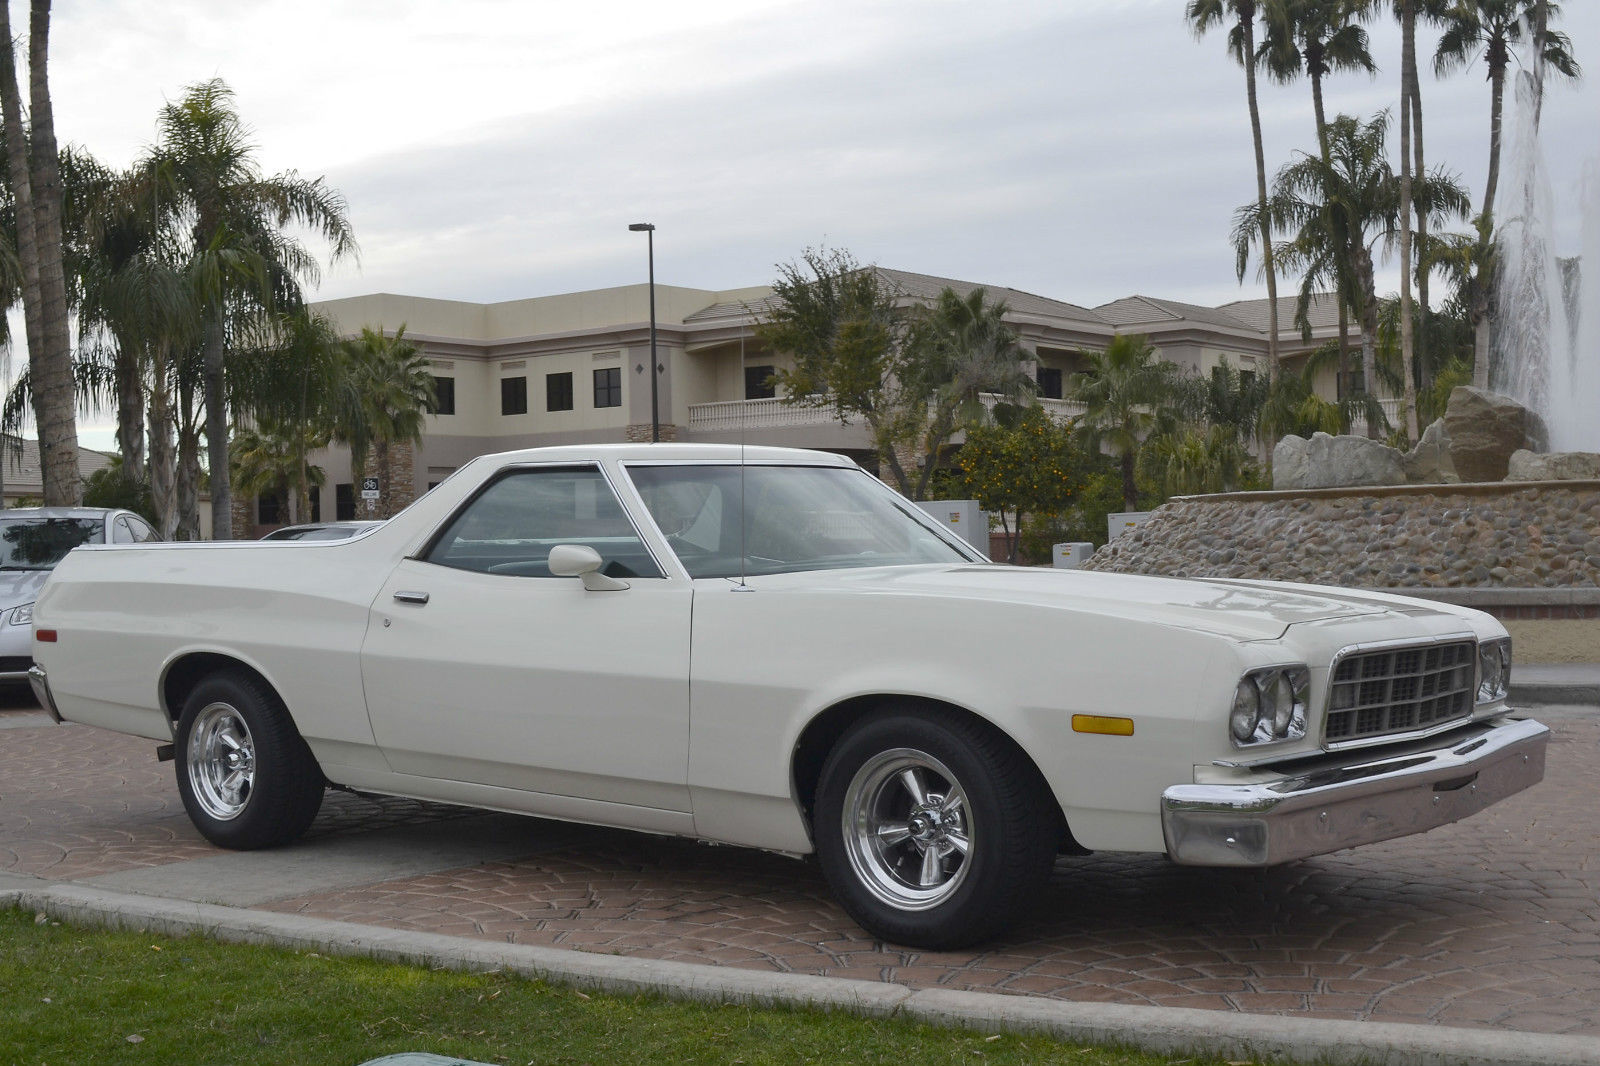 1973 Ford Ranchero Custom Street Hot Rod Arizona Car